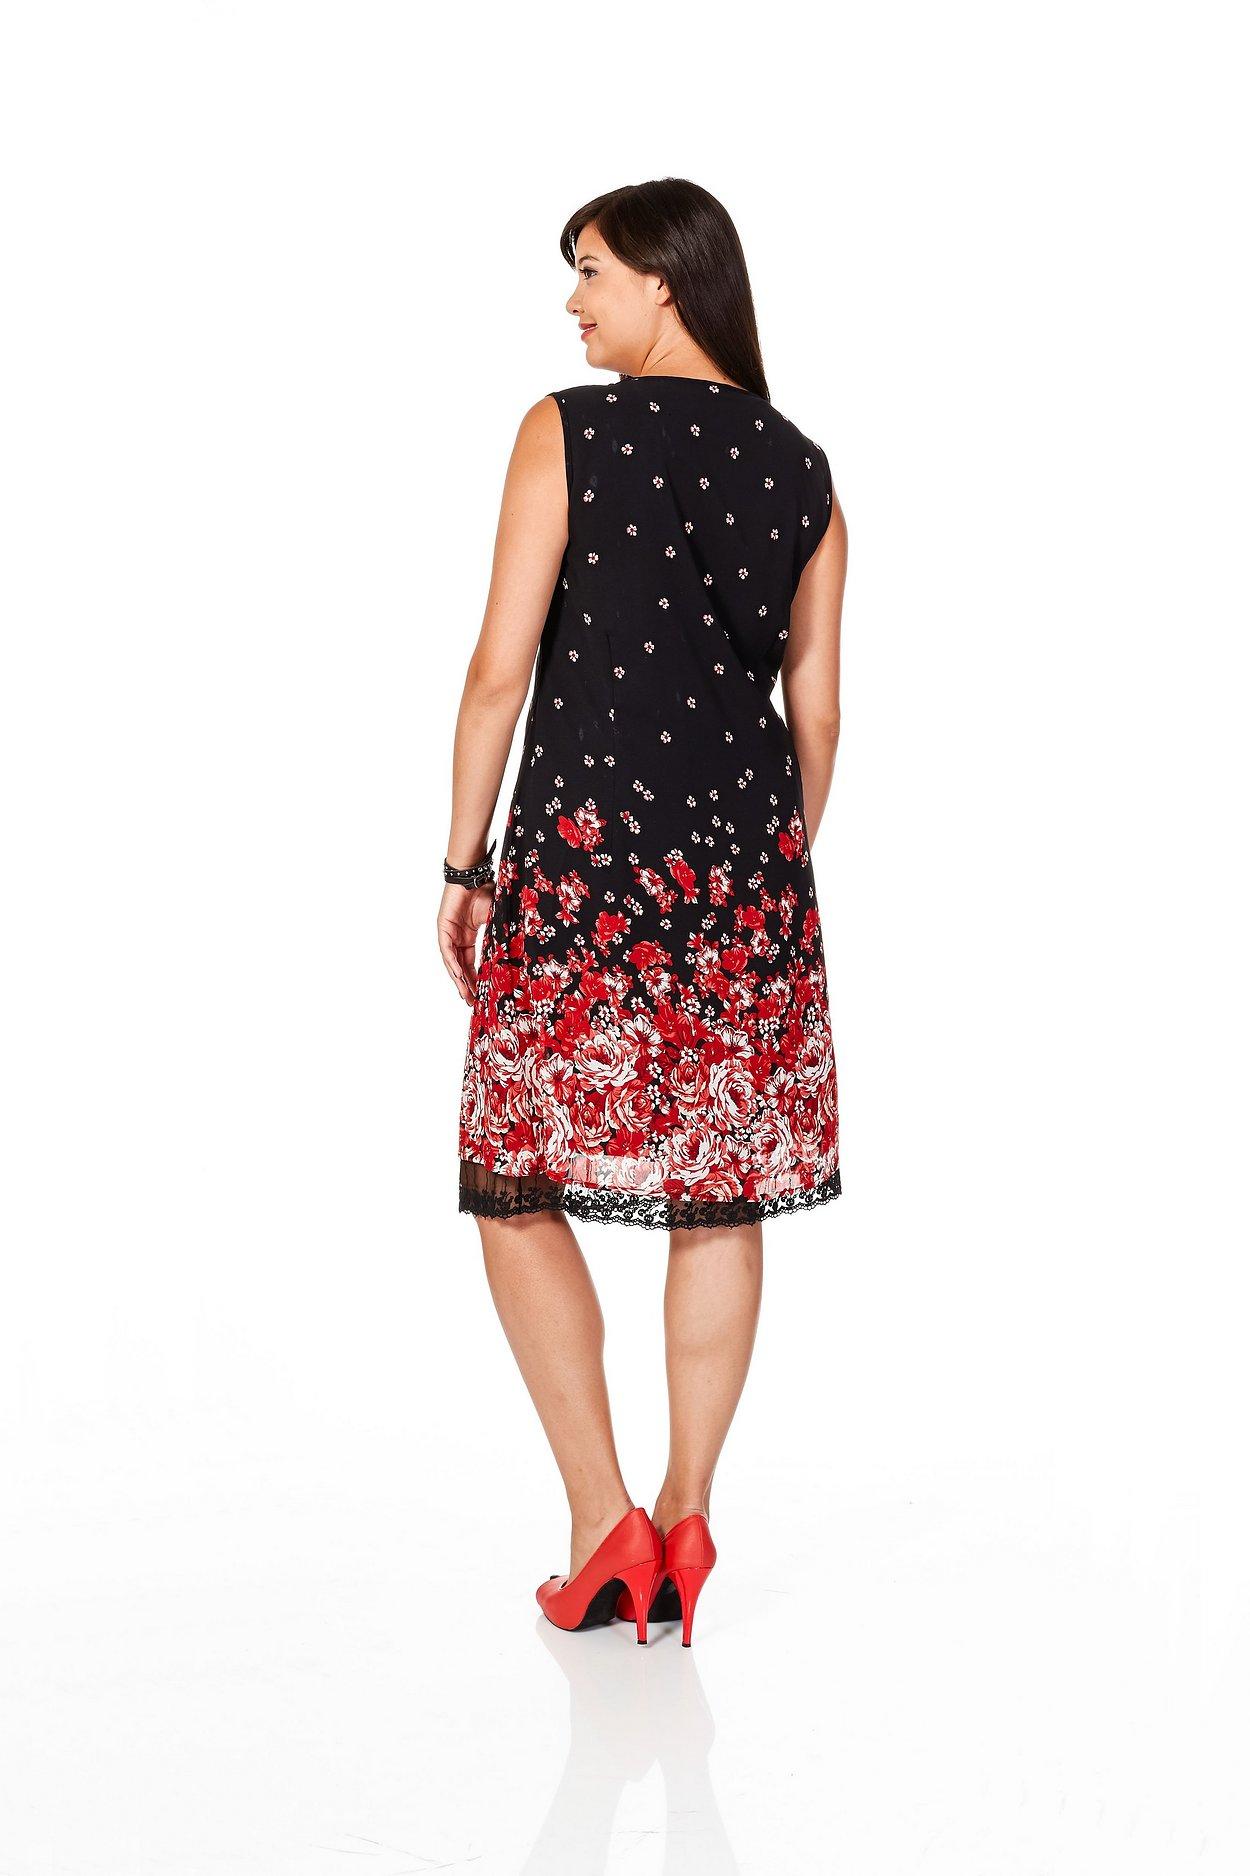 Blütendruck Rot Kleid Schwarz Sheego Style Mit Pw8kn0OX